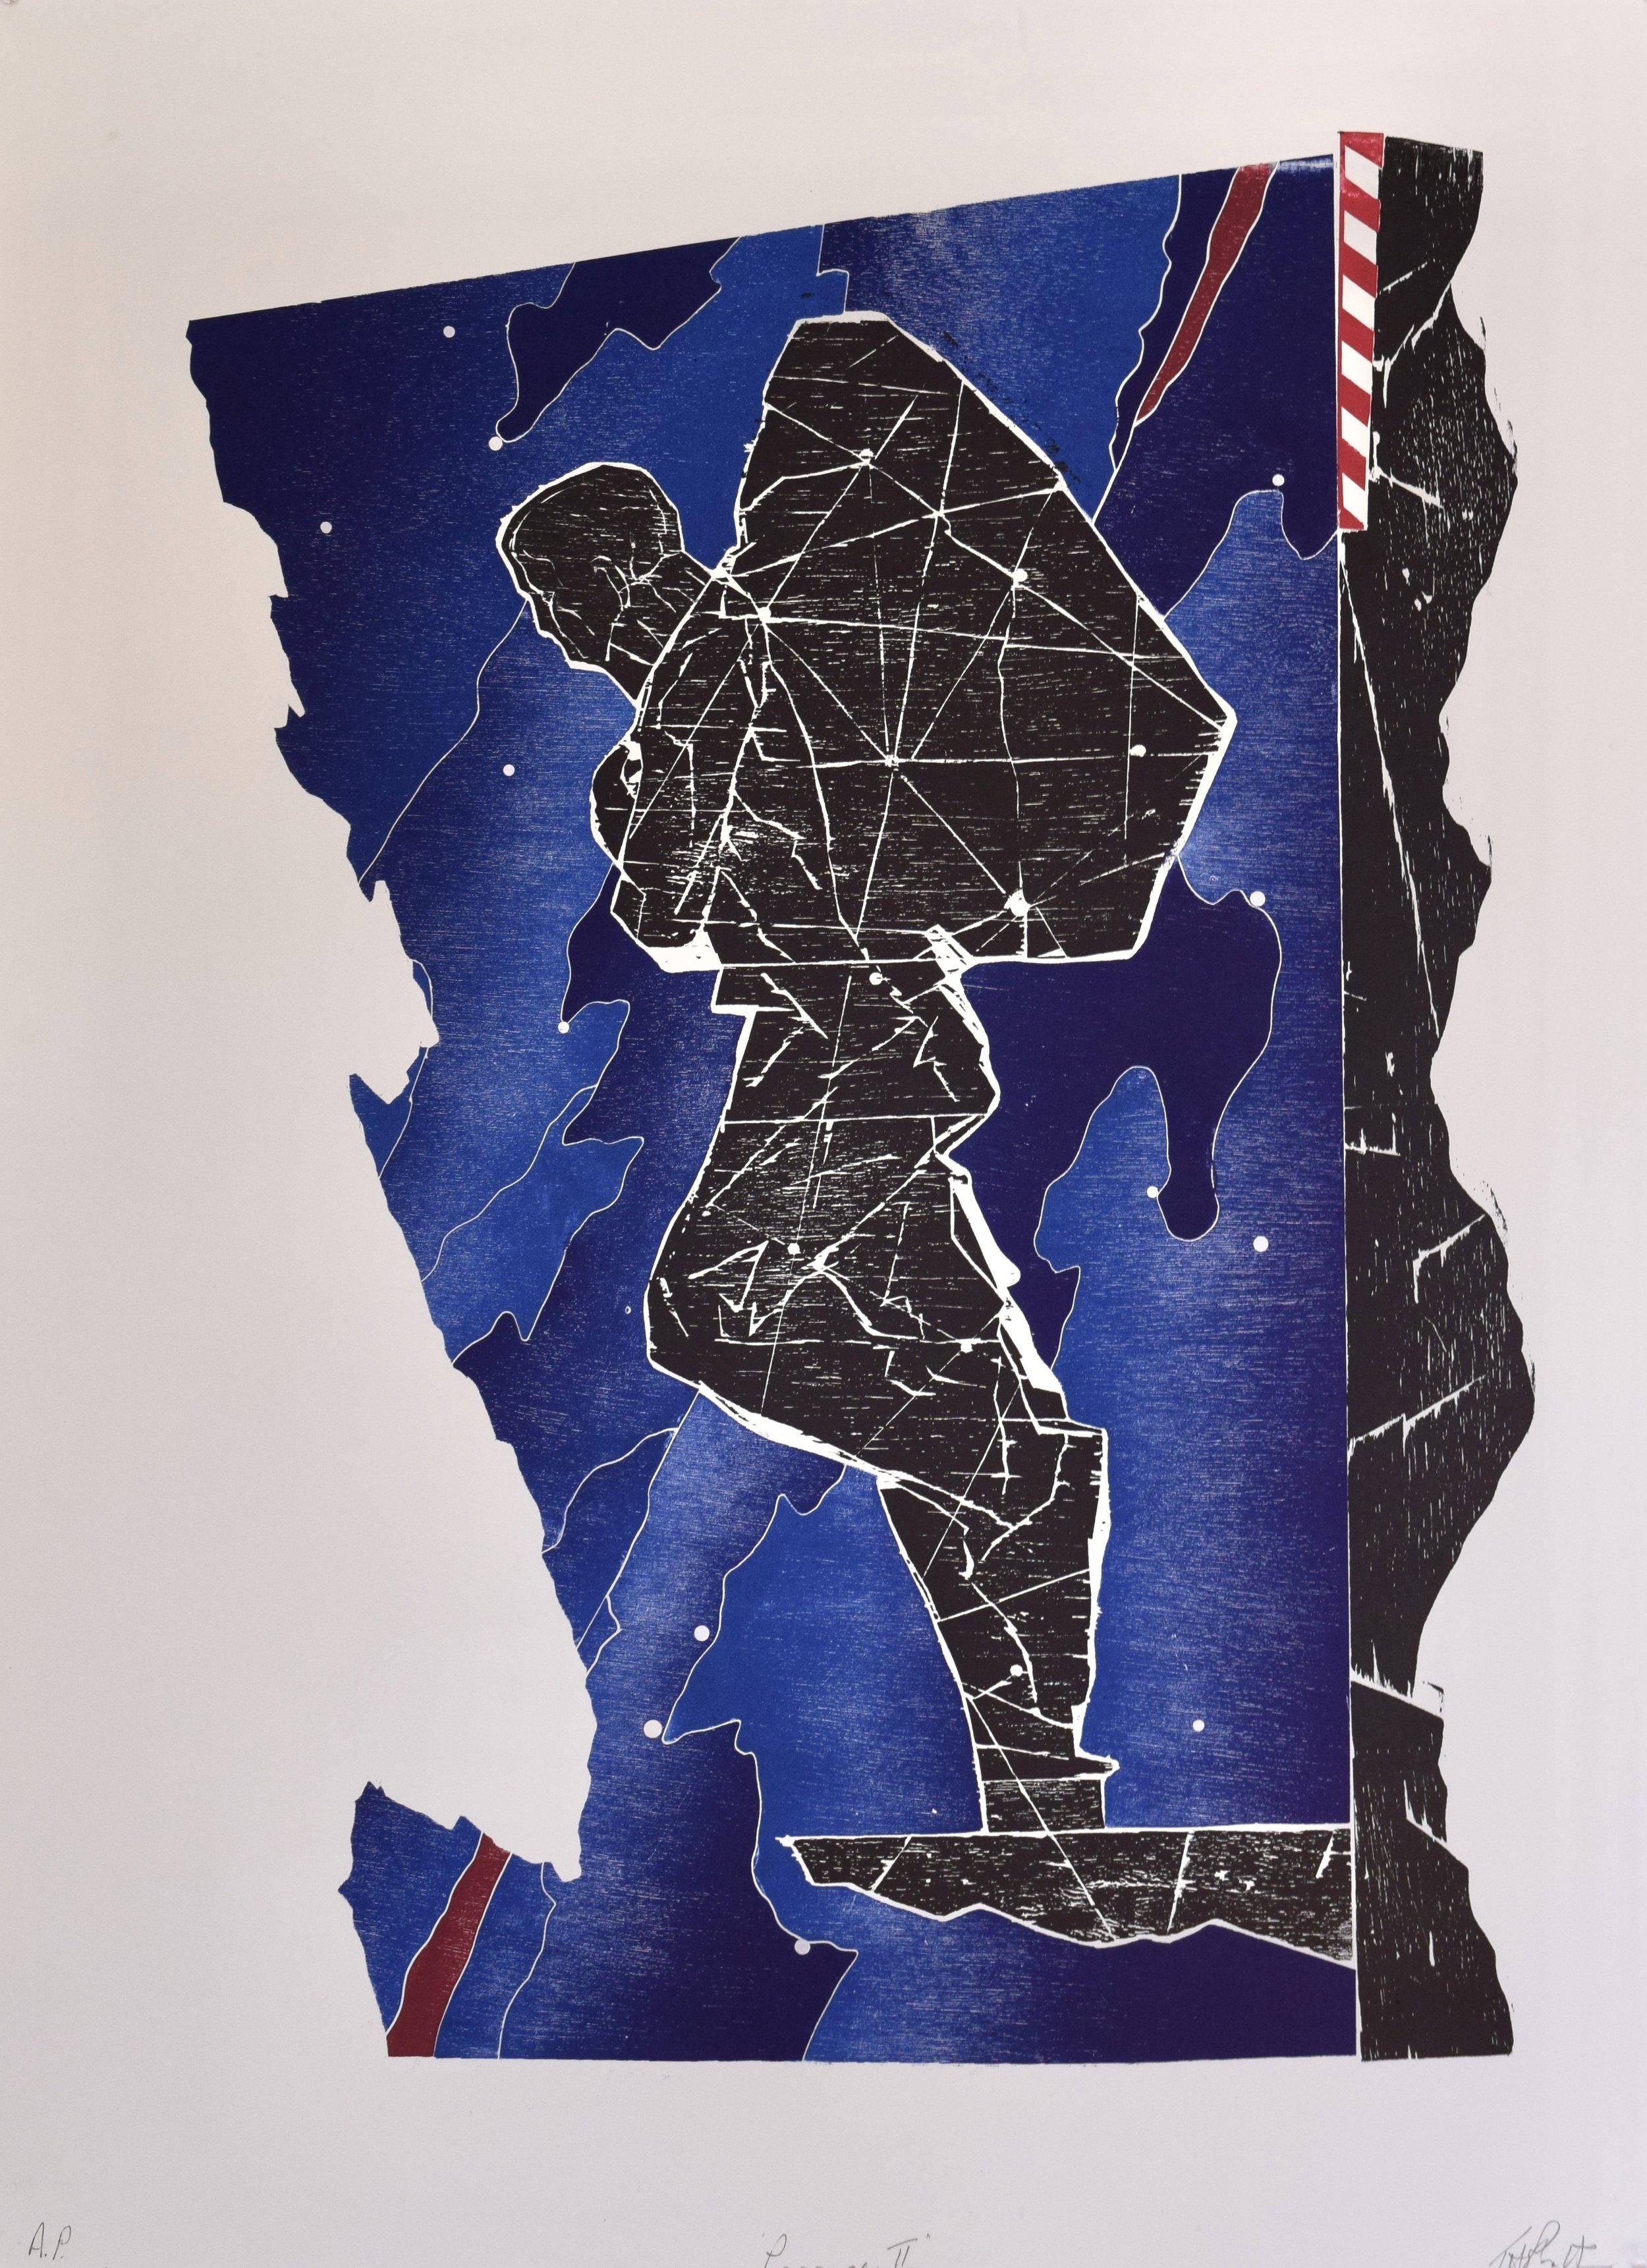 Passage II , John Pratt, woodcut/collage, 2018